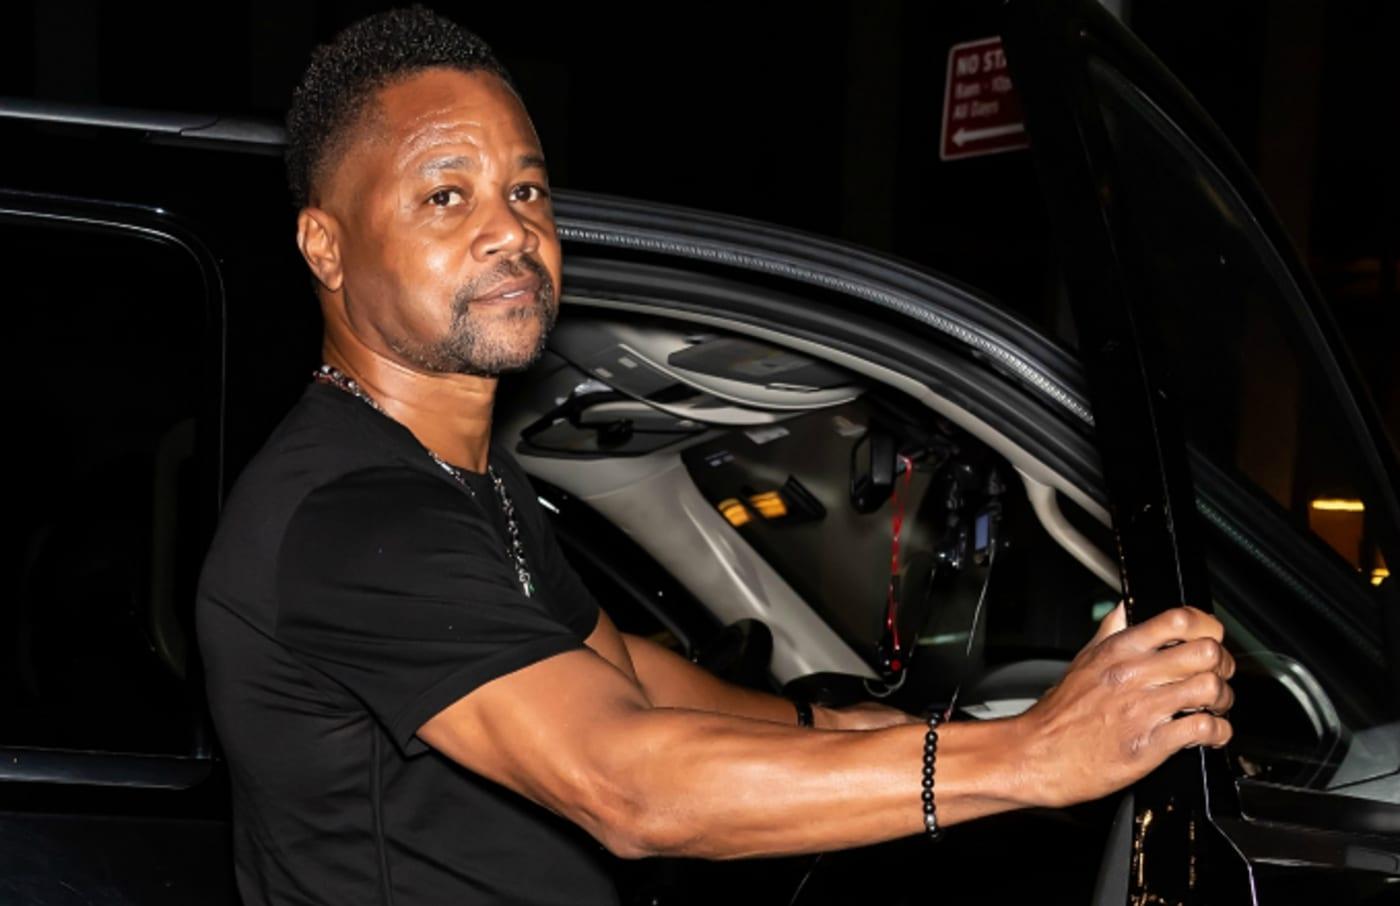 Actor Cuba Gooding Jr. is seen leaving ELLE, Women in Music presented by Spotify